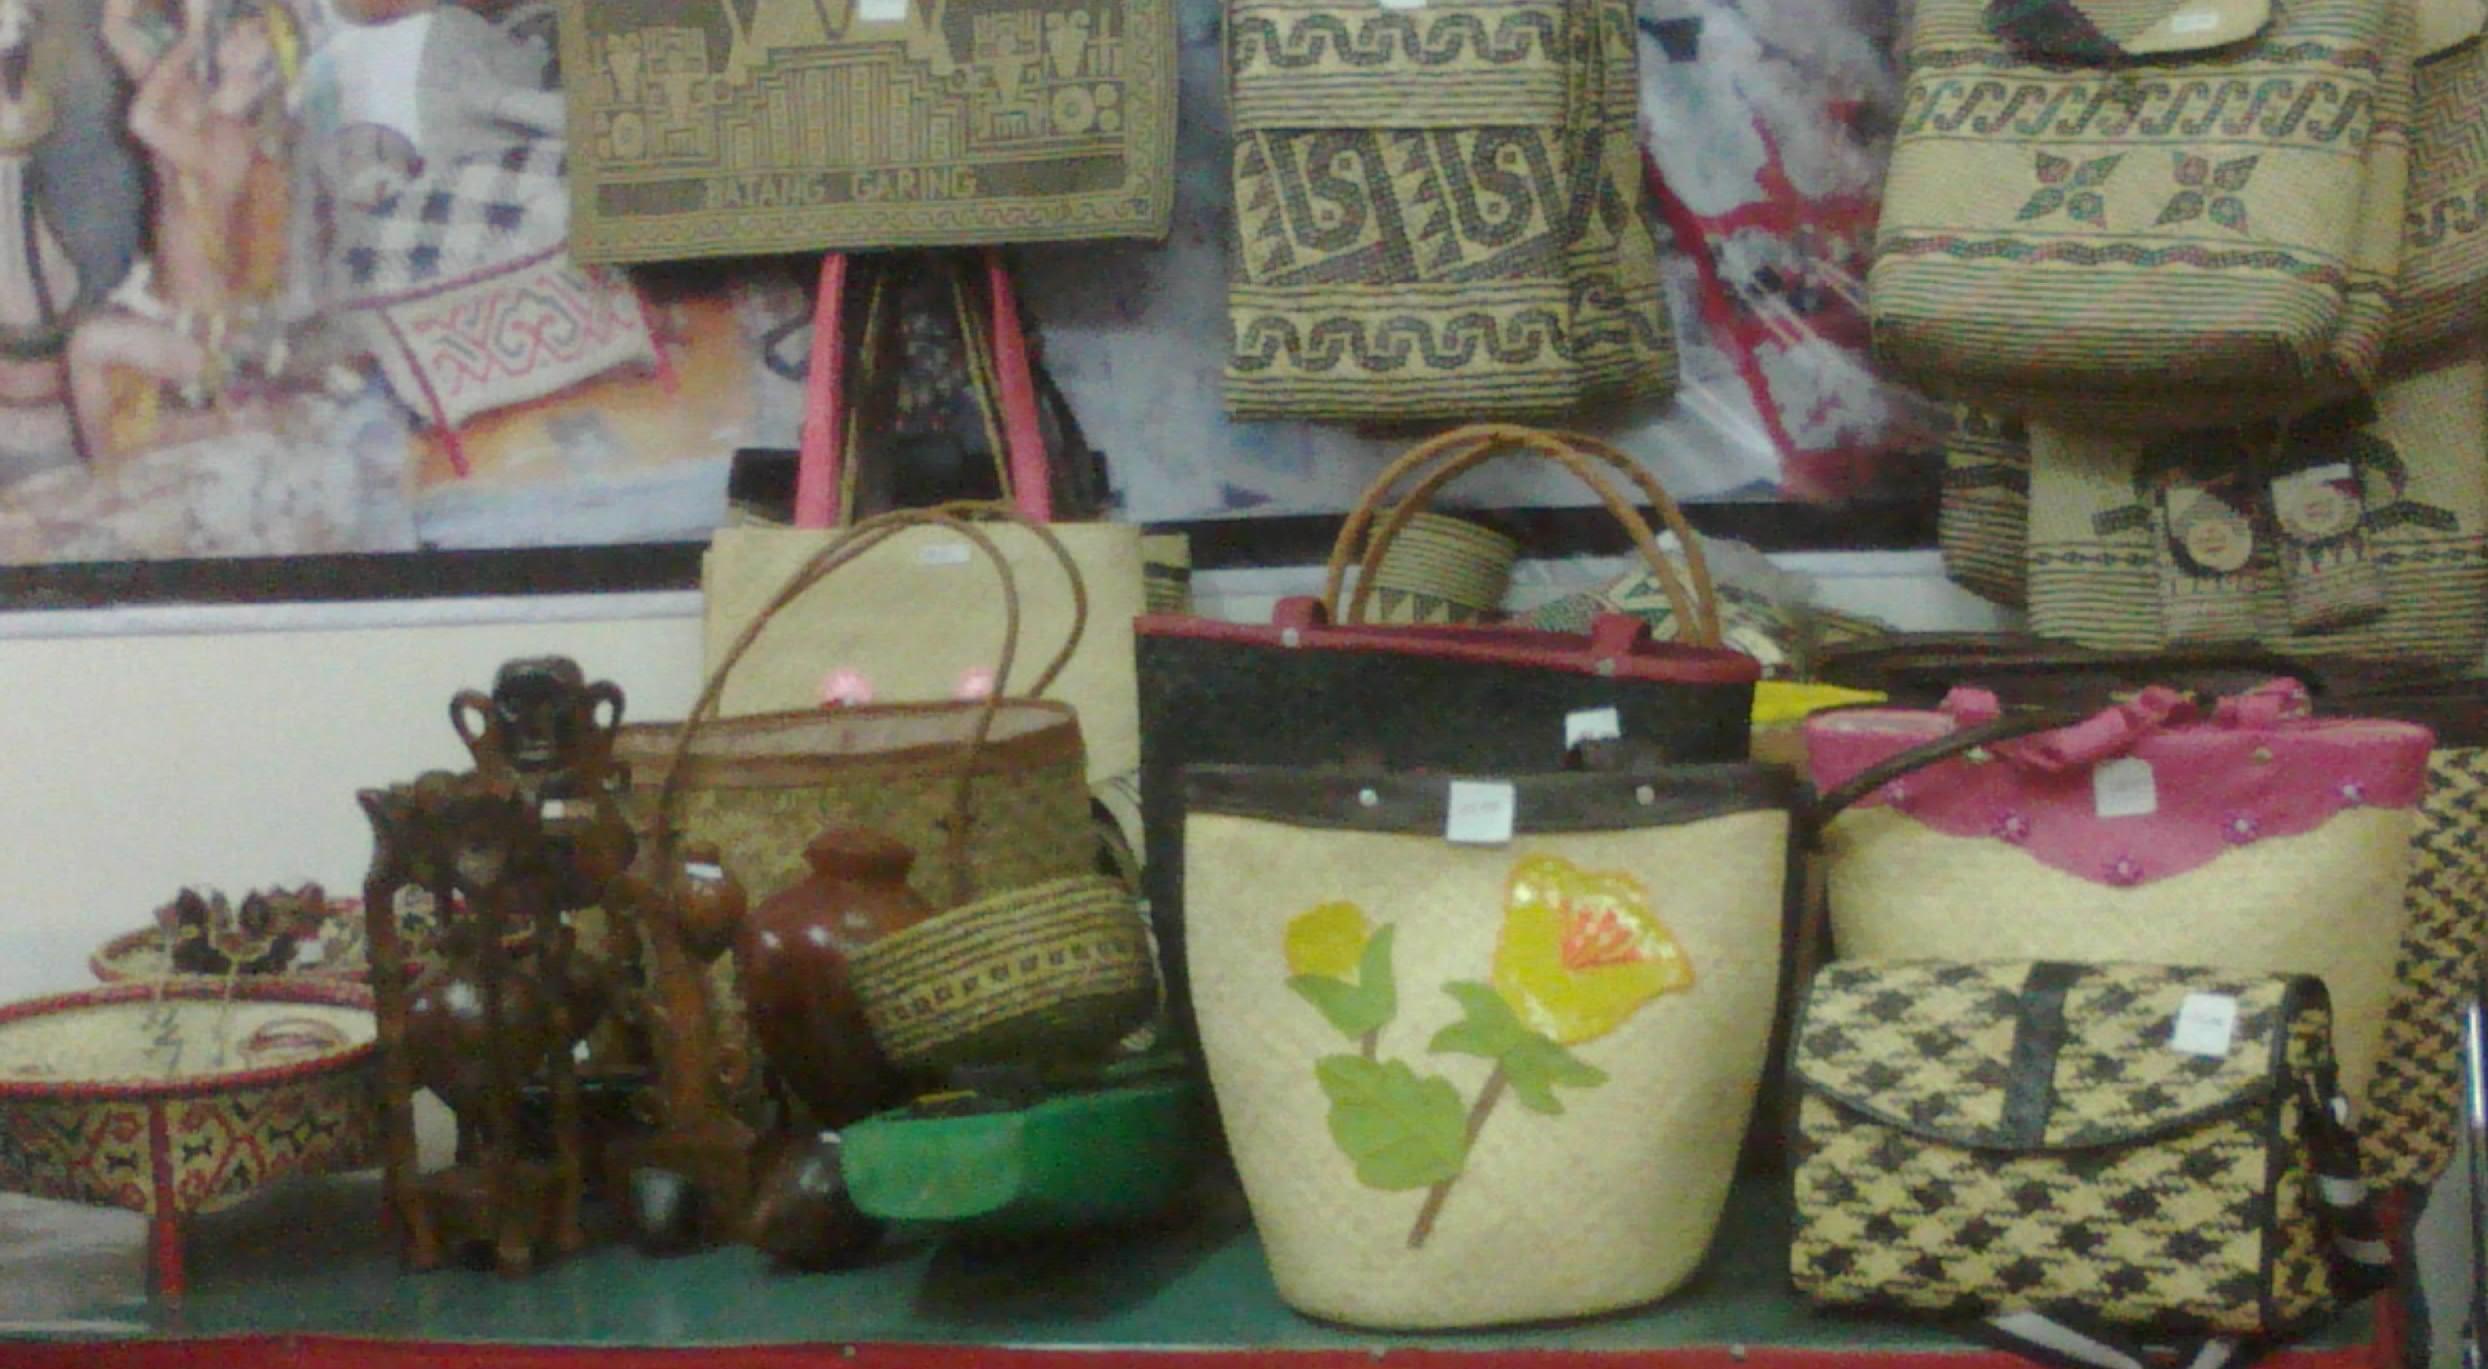 tas - tas unik dan lucu dari anyaman bambu